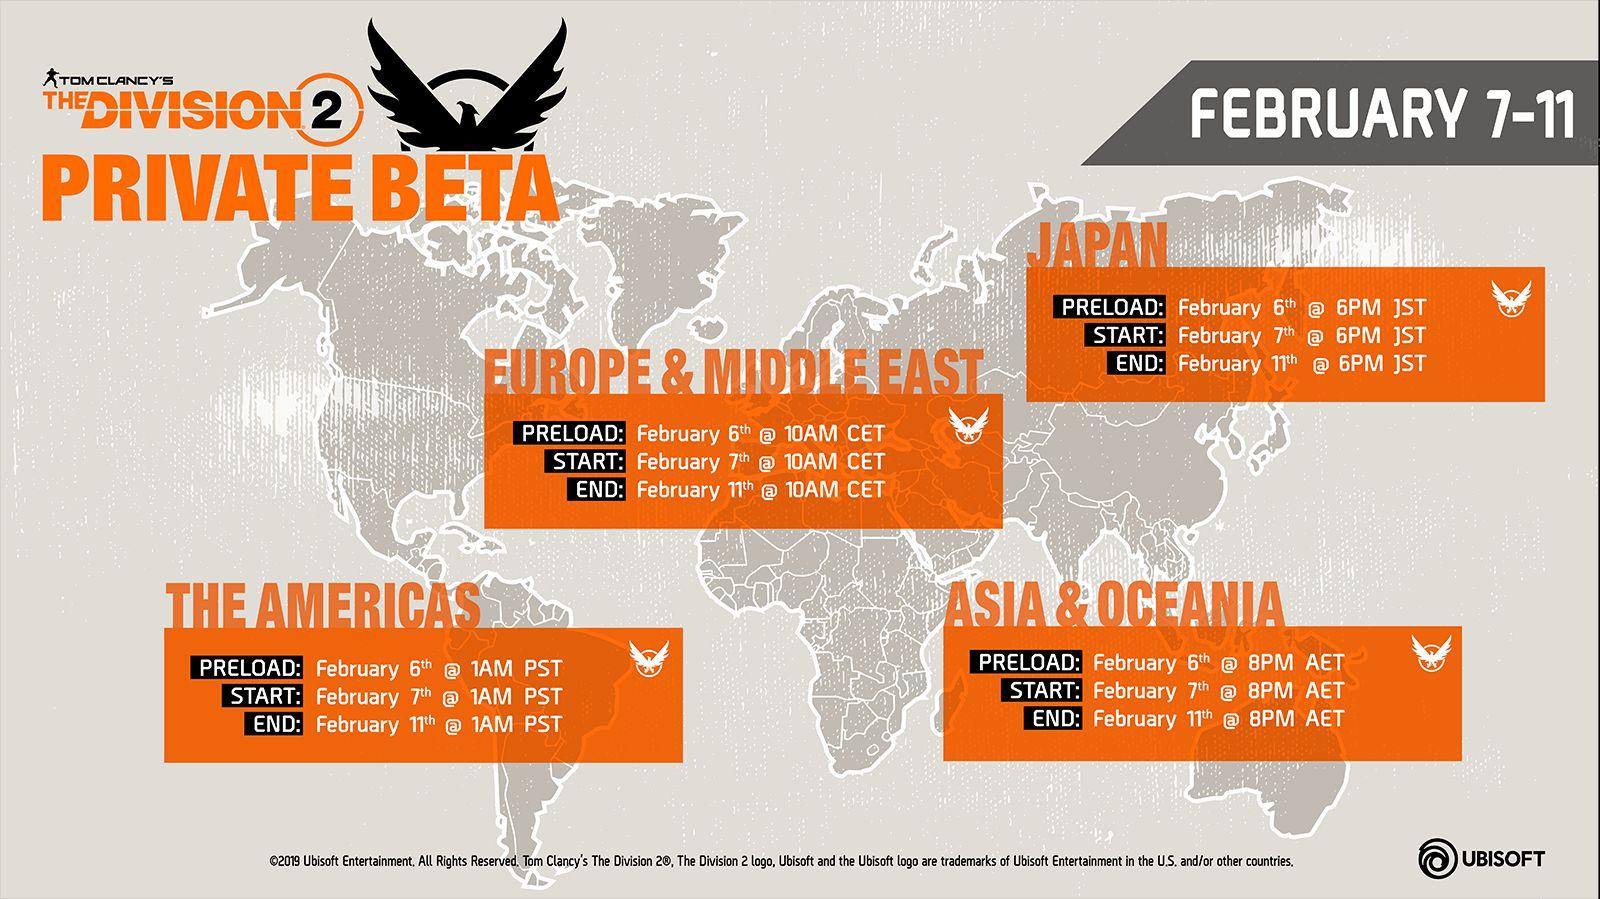 The Division 2 beta timings